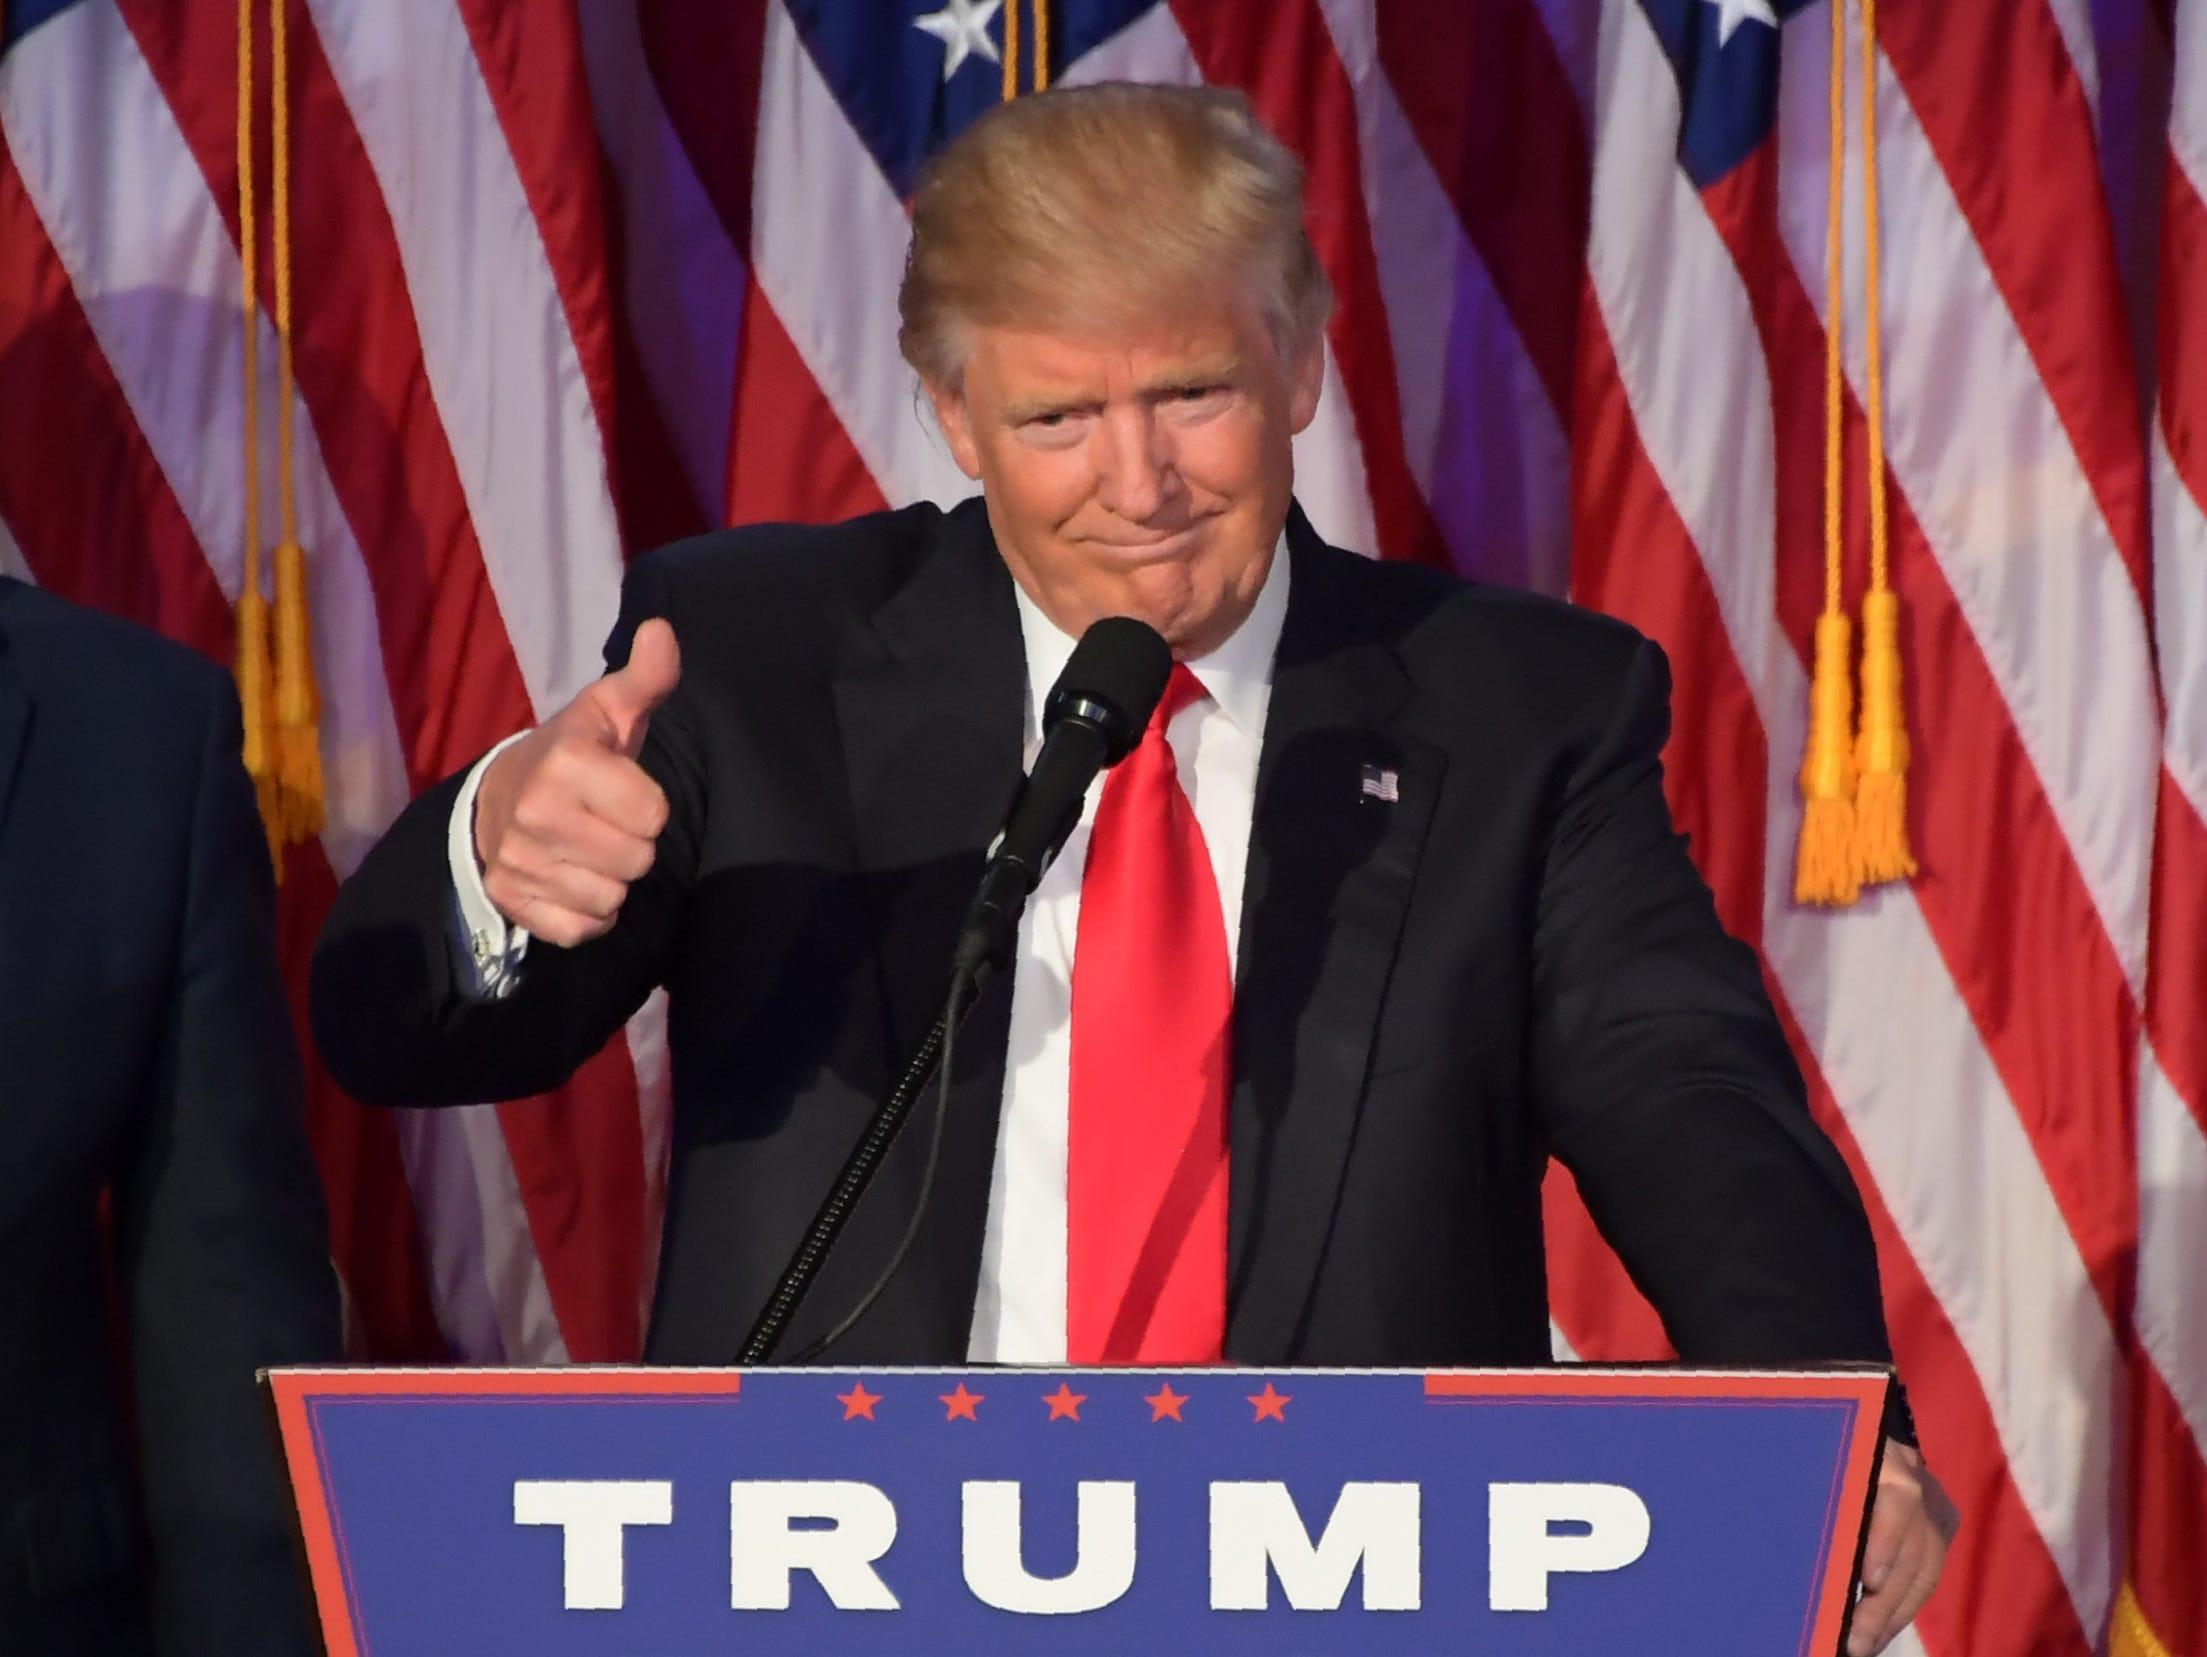 Trump: Why didn't marchers vote?